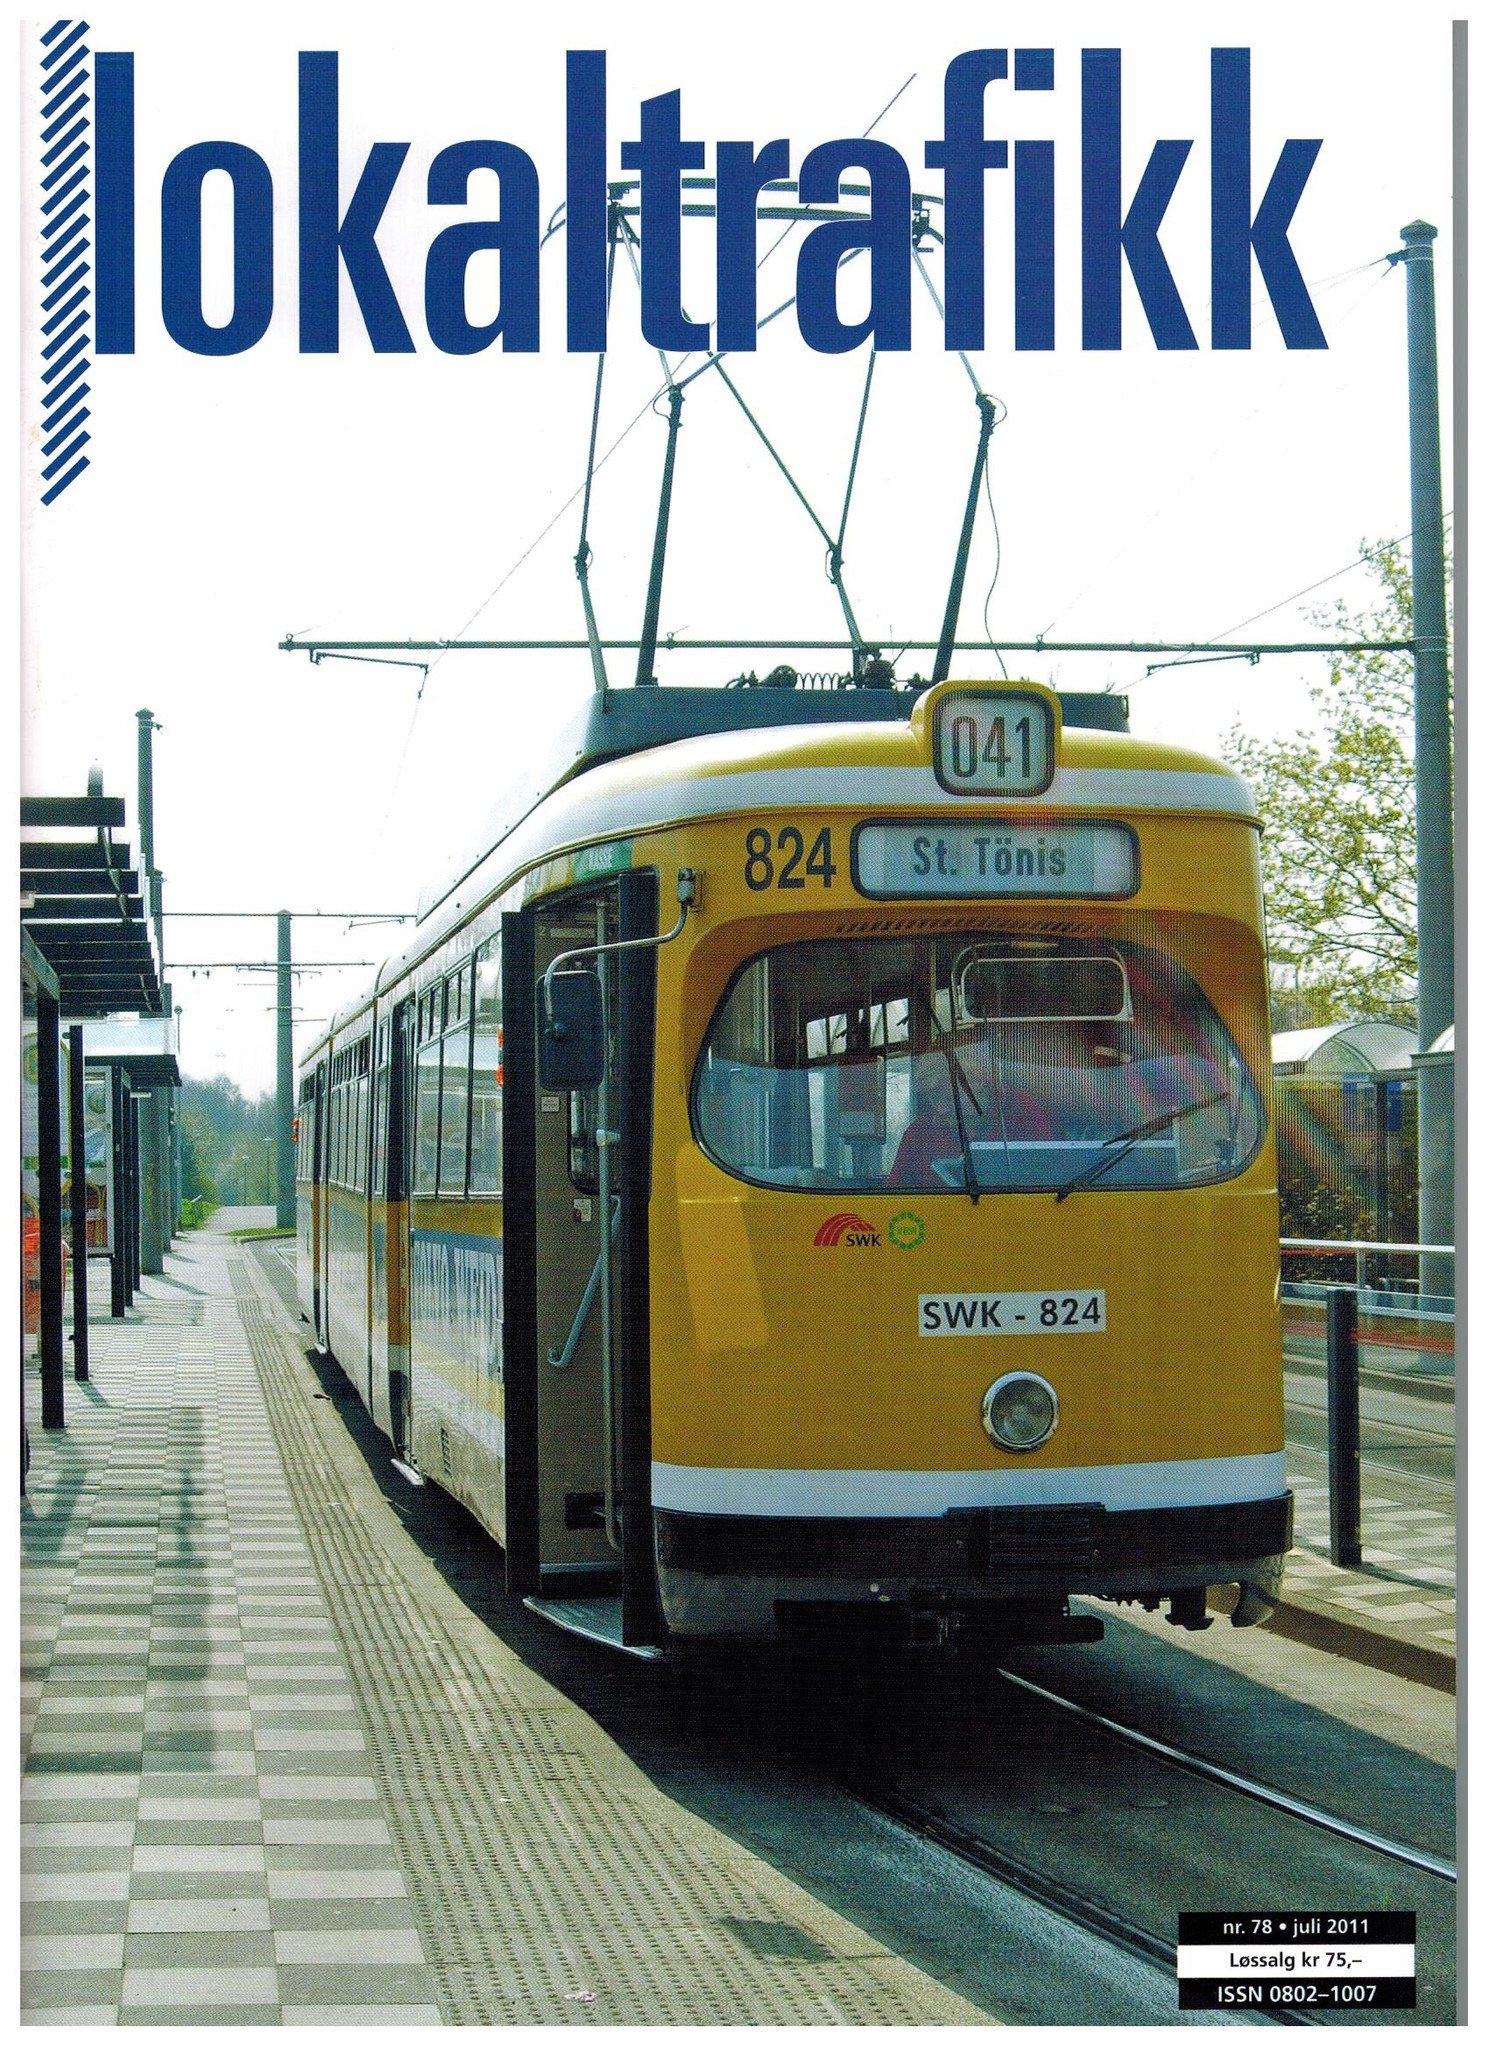 Lokaltrafikk #078